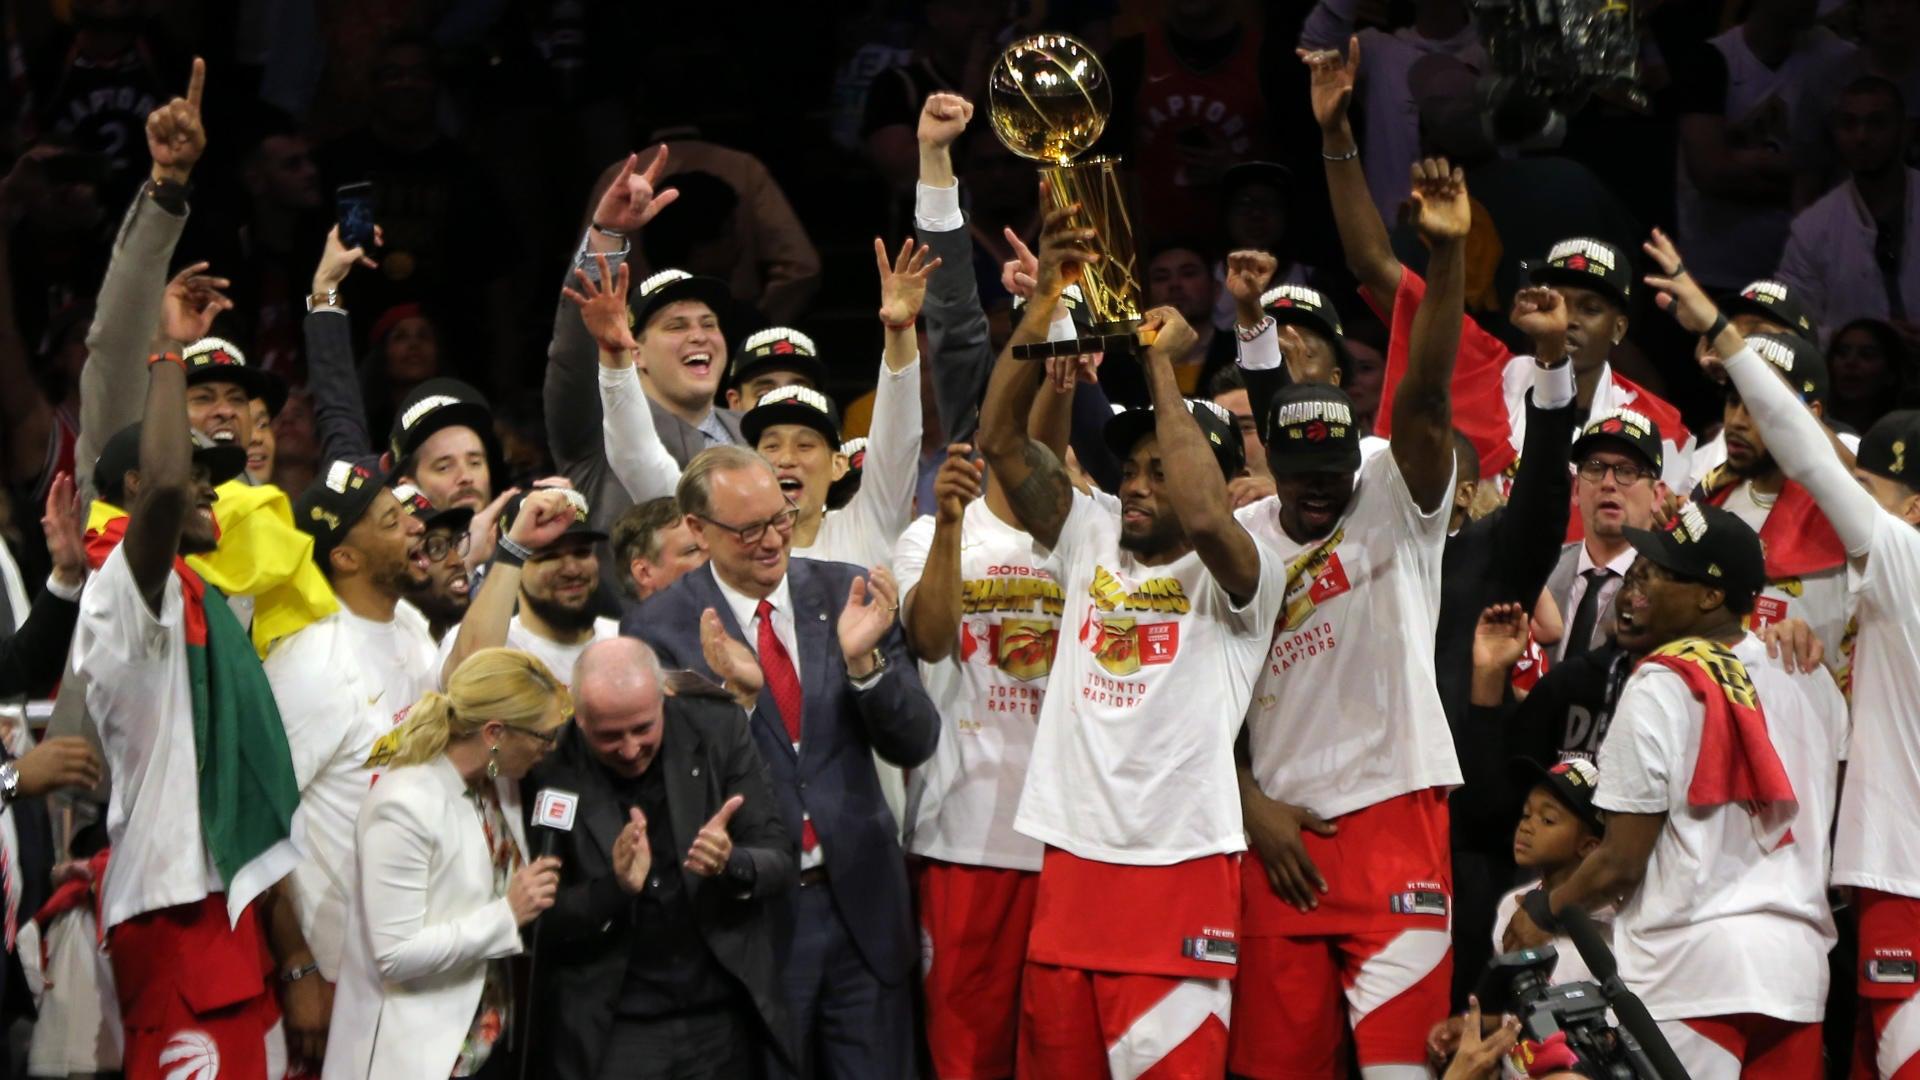 Drake releasing two new songs in celebration of Raptors winning 2019 NBA Finals